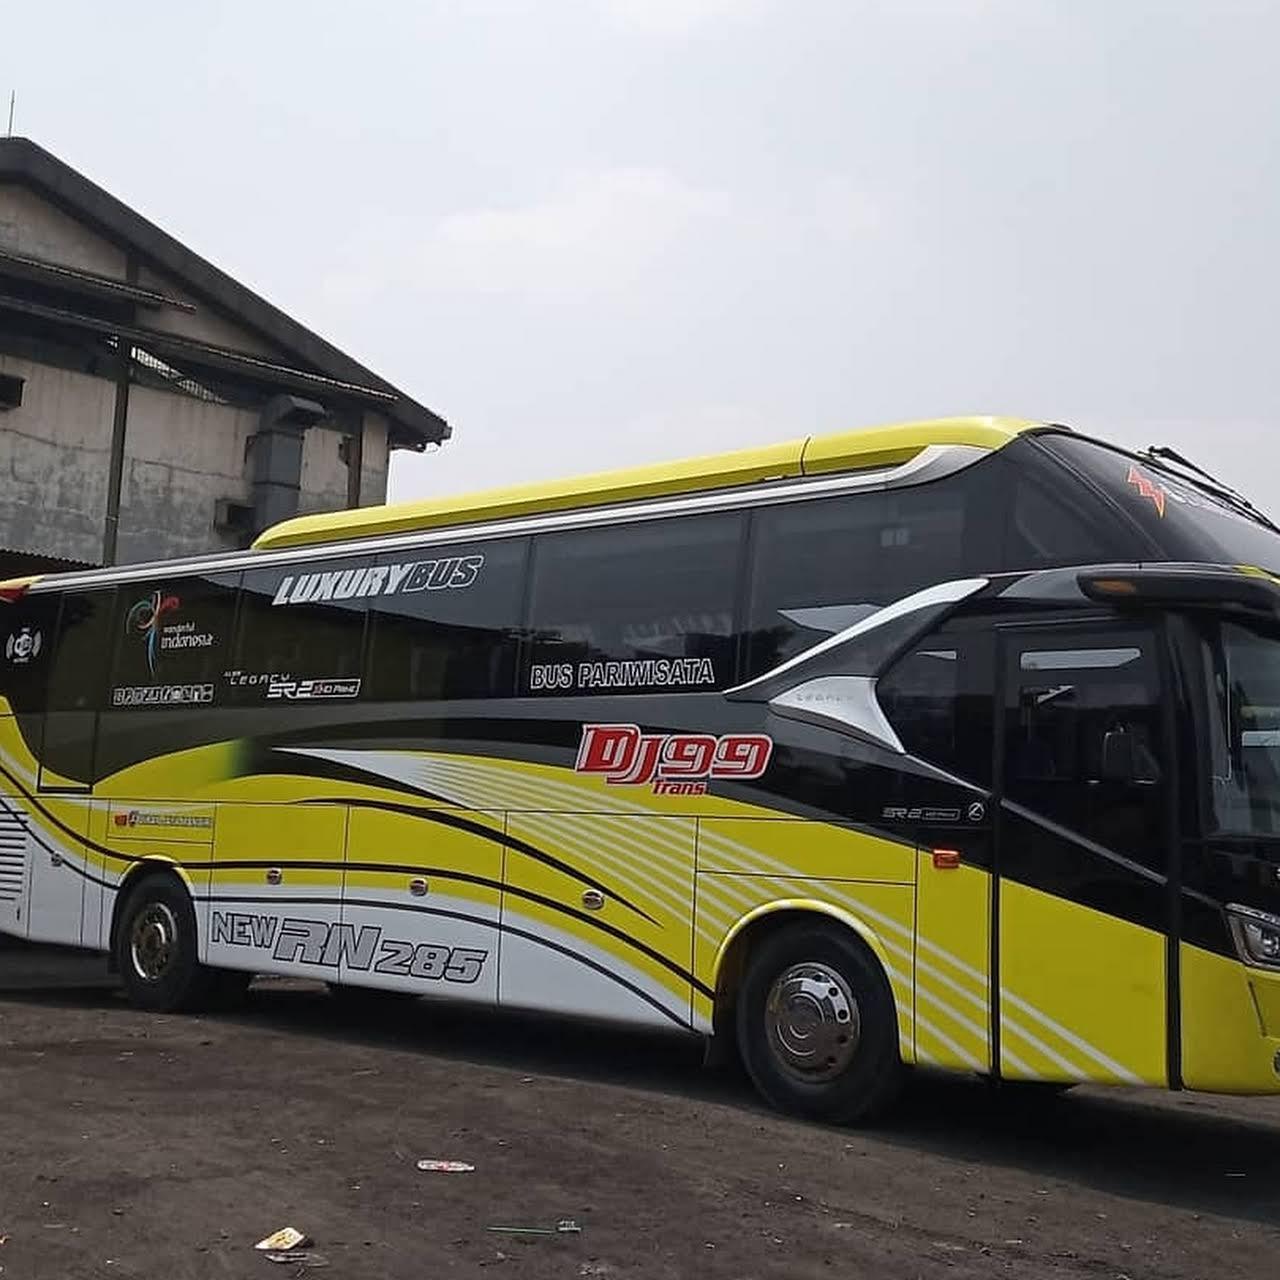 Sewa Bus Pariwisata Gracias Hiace  Jakarta Diposting Pada 13 Okt 18